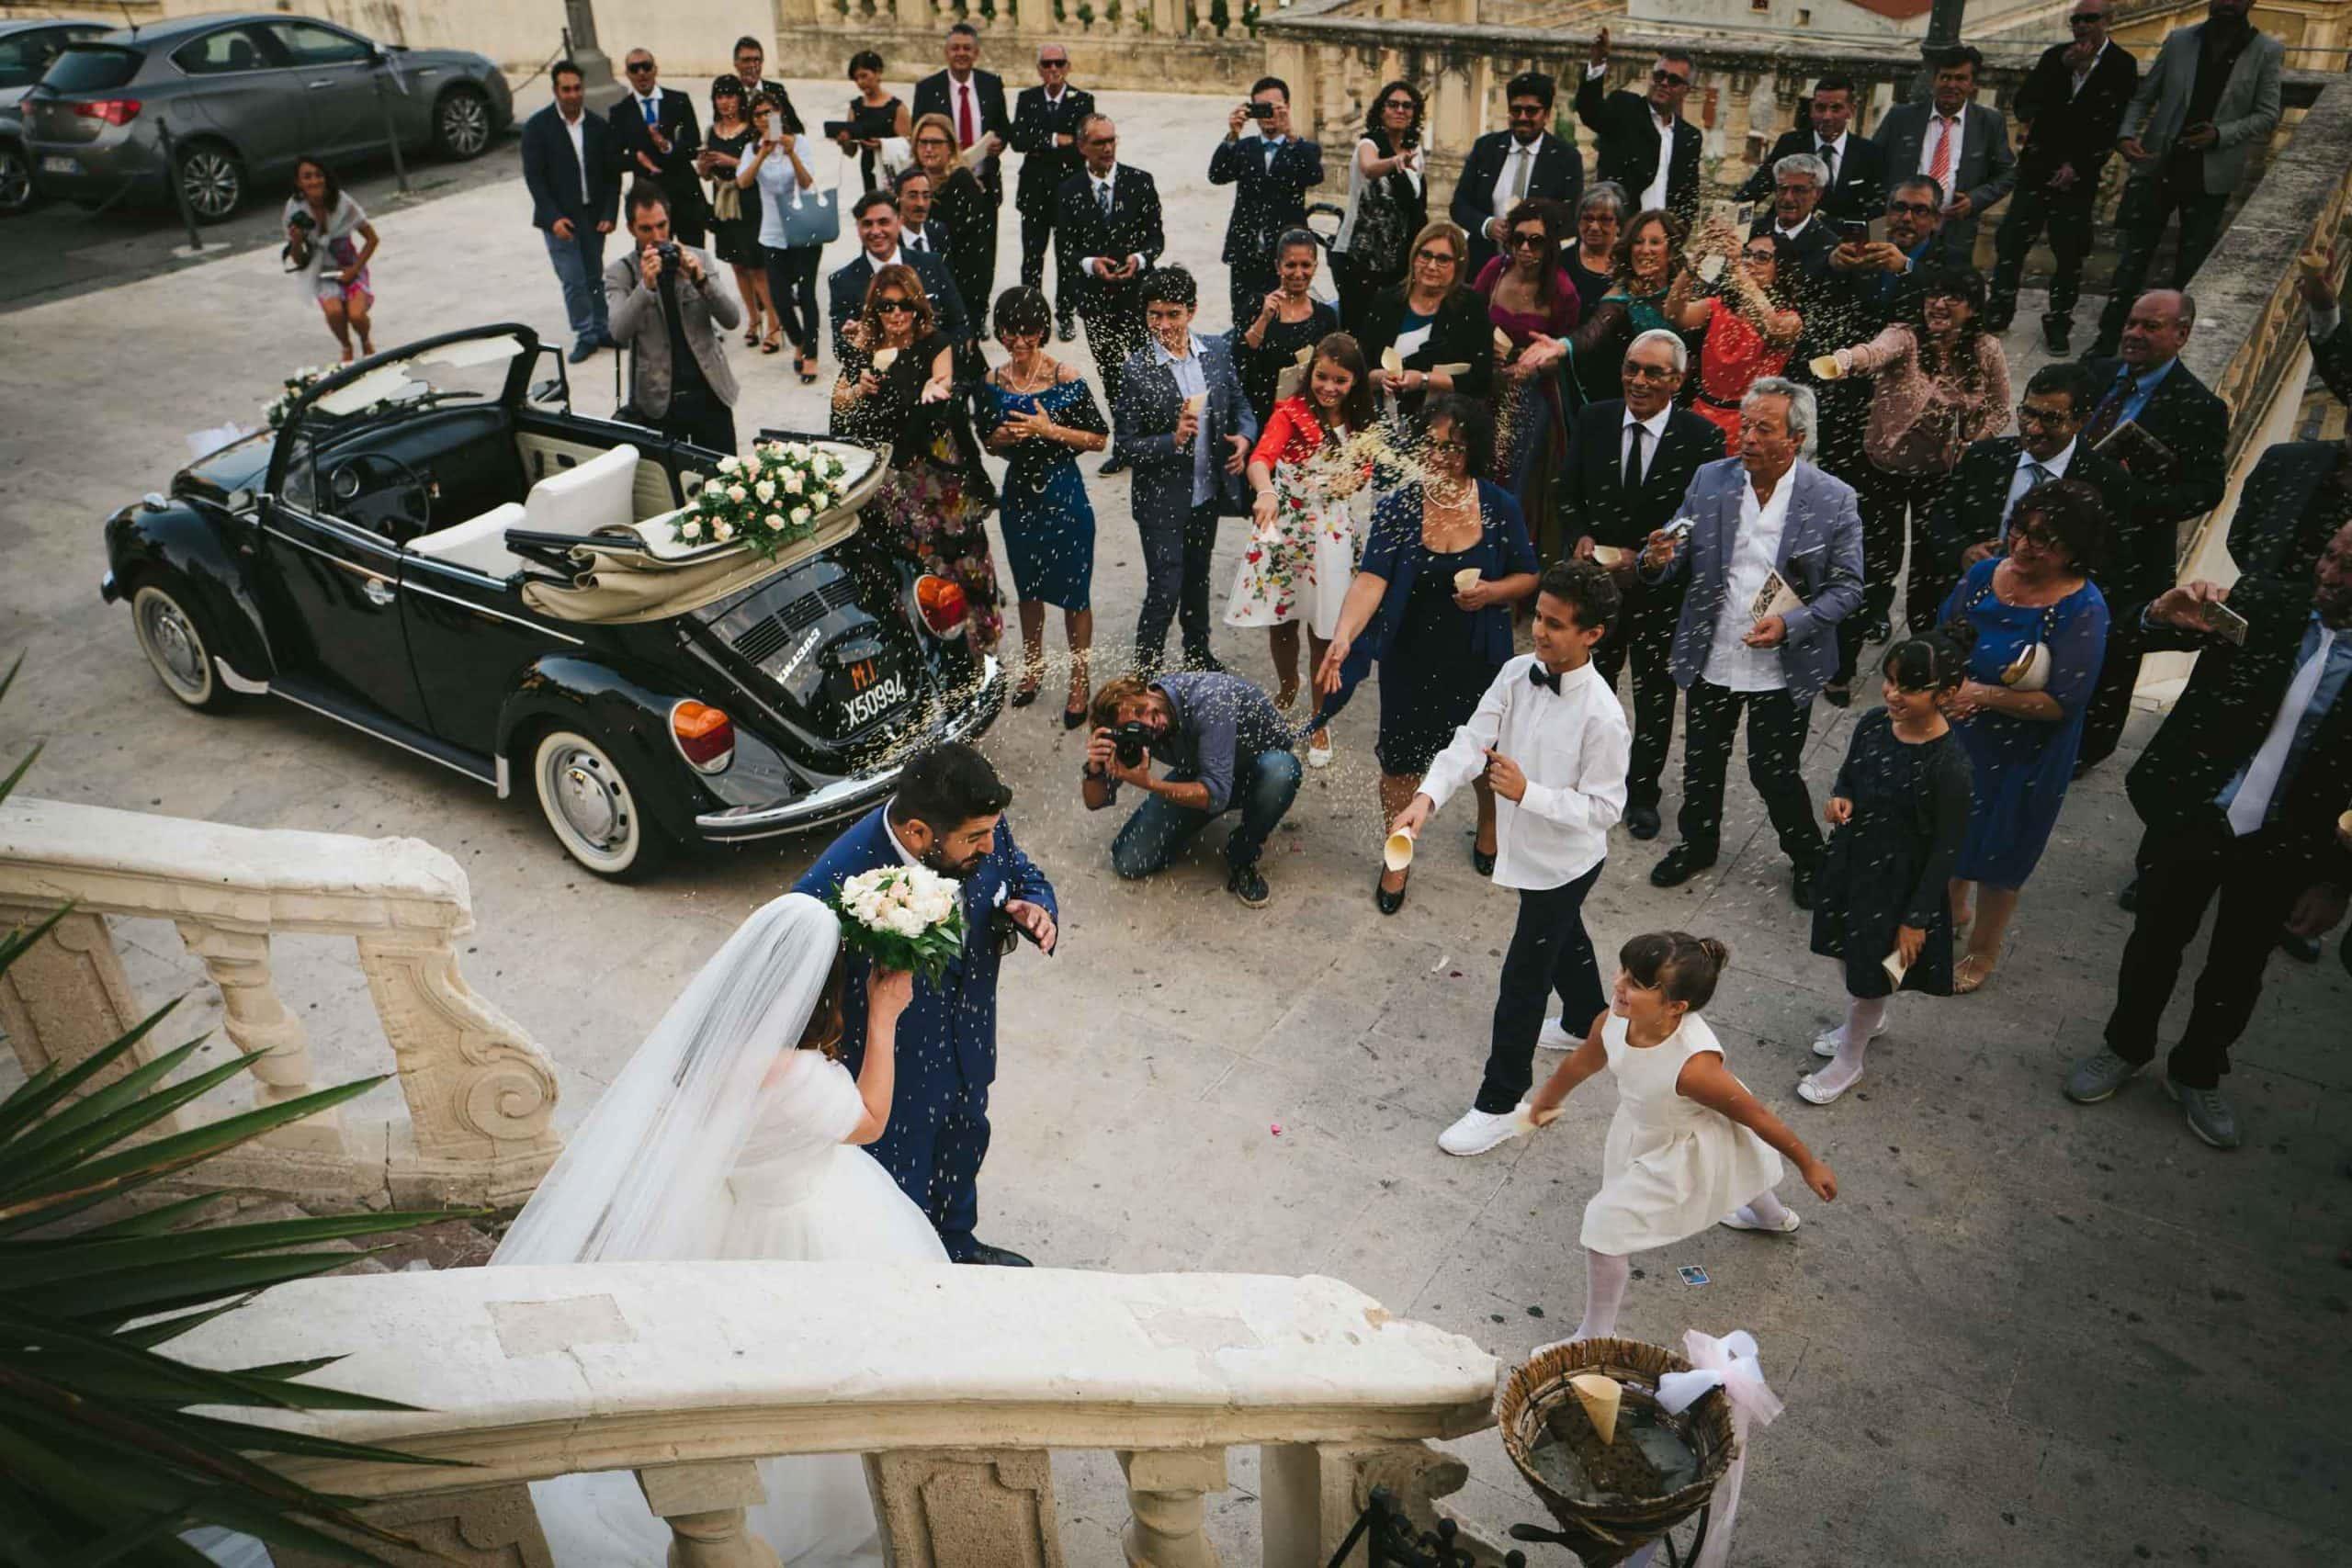 wedding day in Sicily - glam